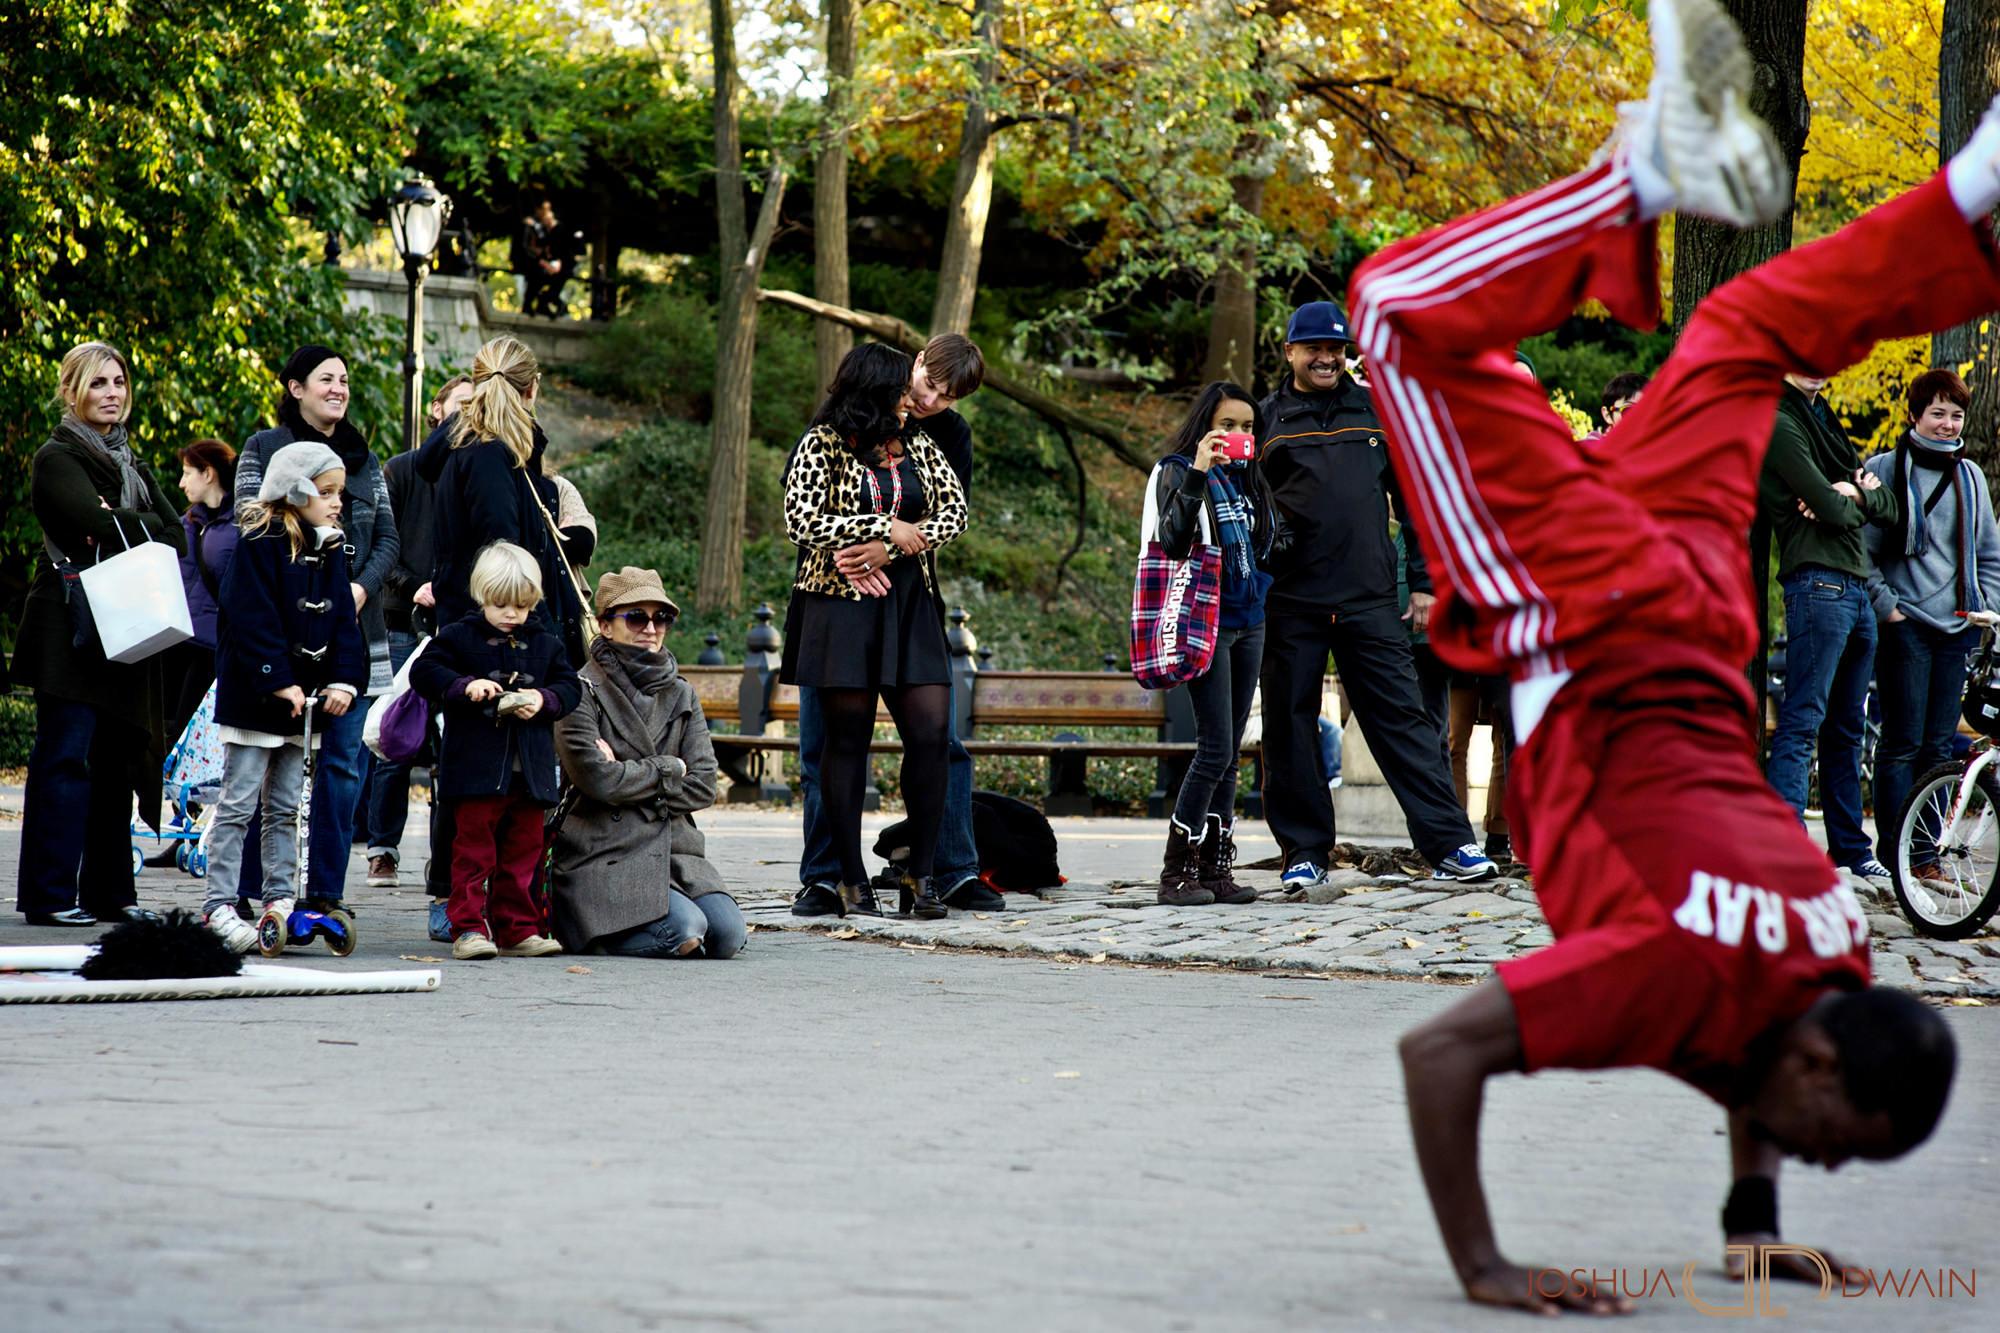 fritzie-stephen-008-central-park-new-york-city-ny-engagement-photographer-joshua-dwain-2011-11-05_fs_035